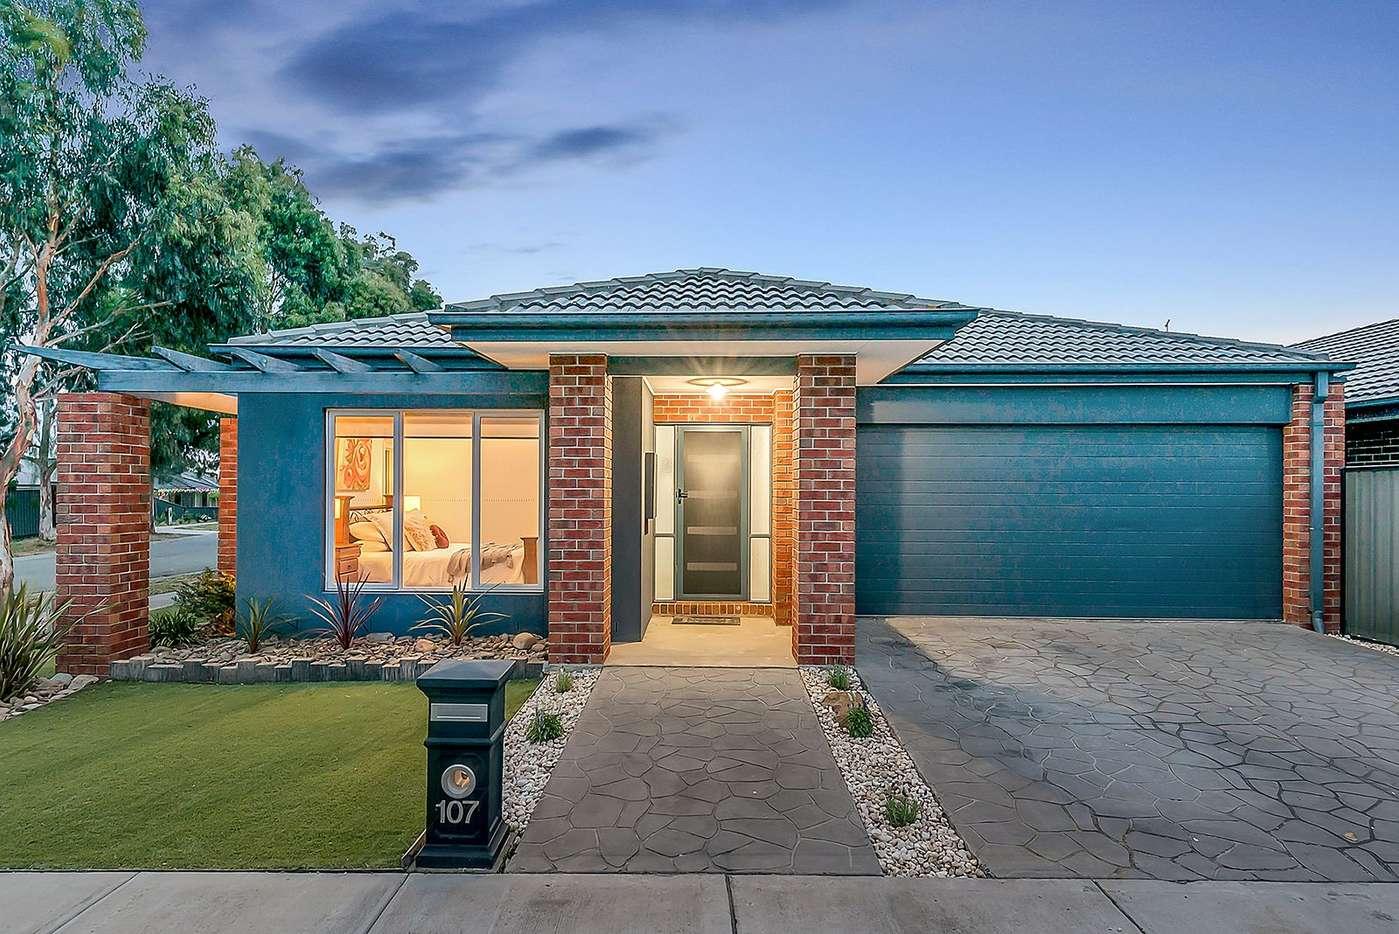 Main view of Homely house listing, 107 Huntington Drive, Craigieburn, VIC 3064